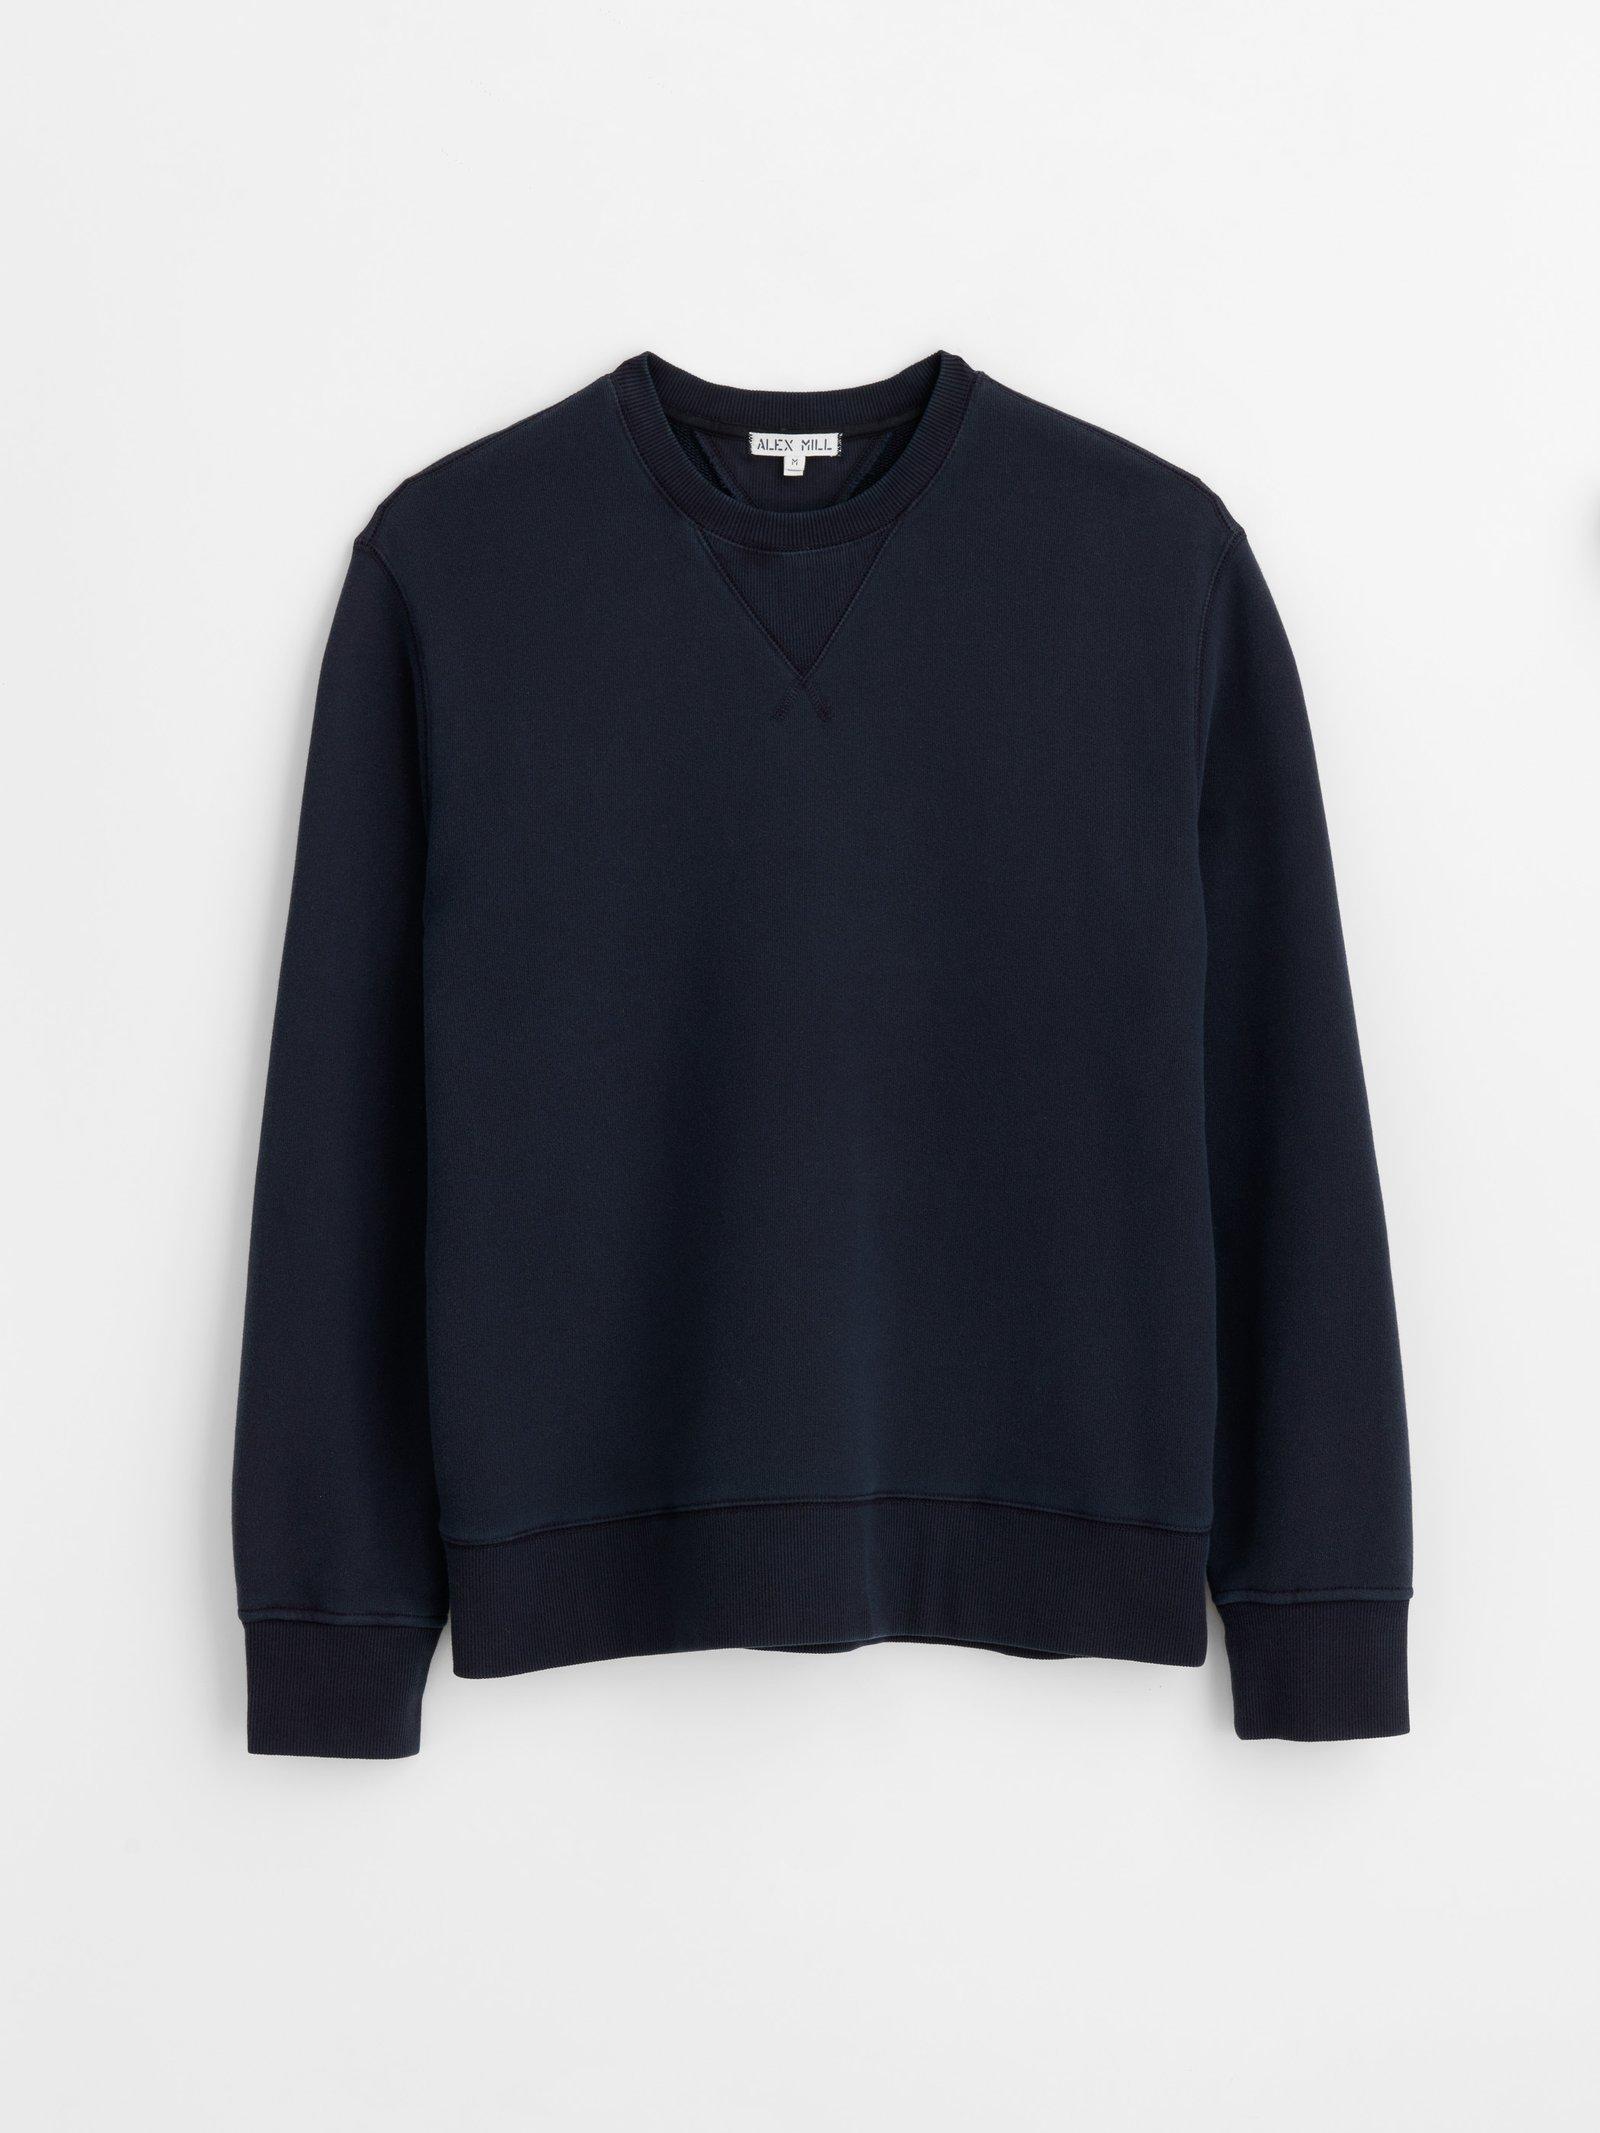 Alex Mill Garment-Dyed Crewneck Sweatshirt